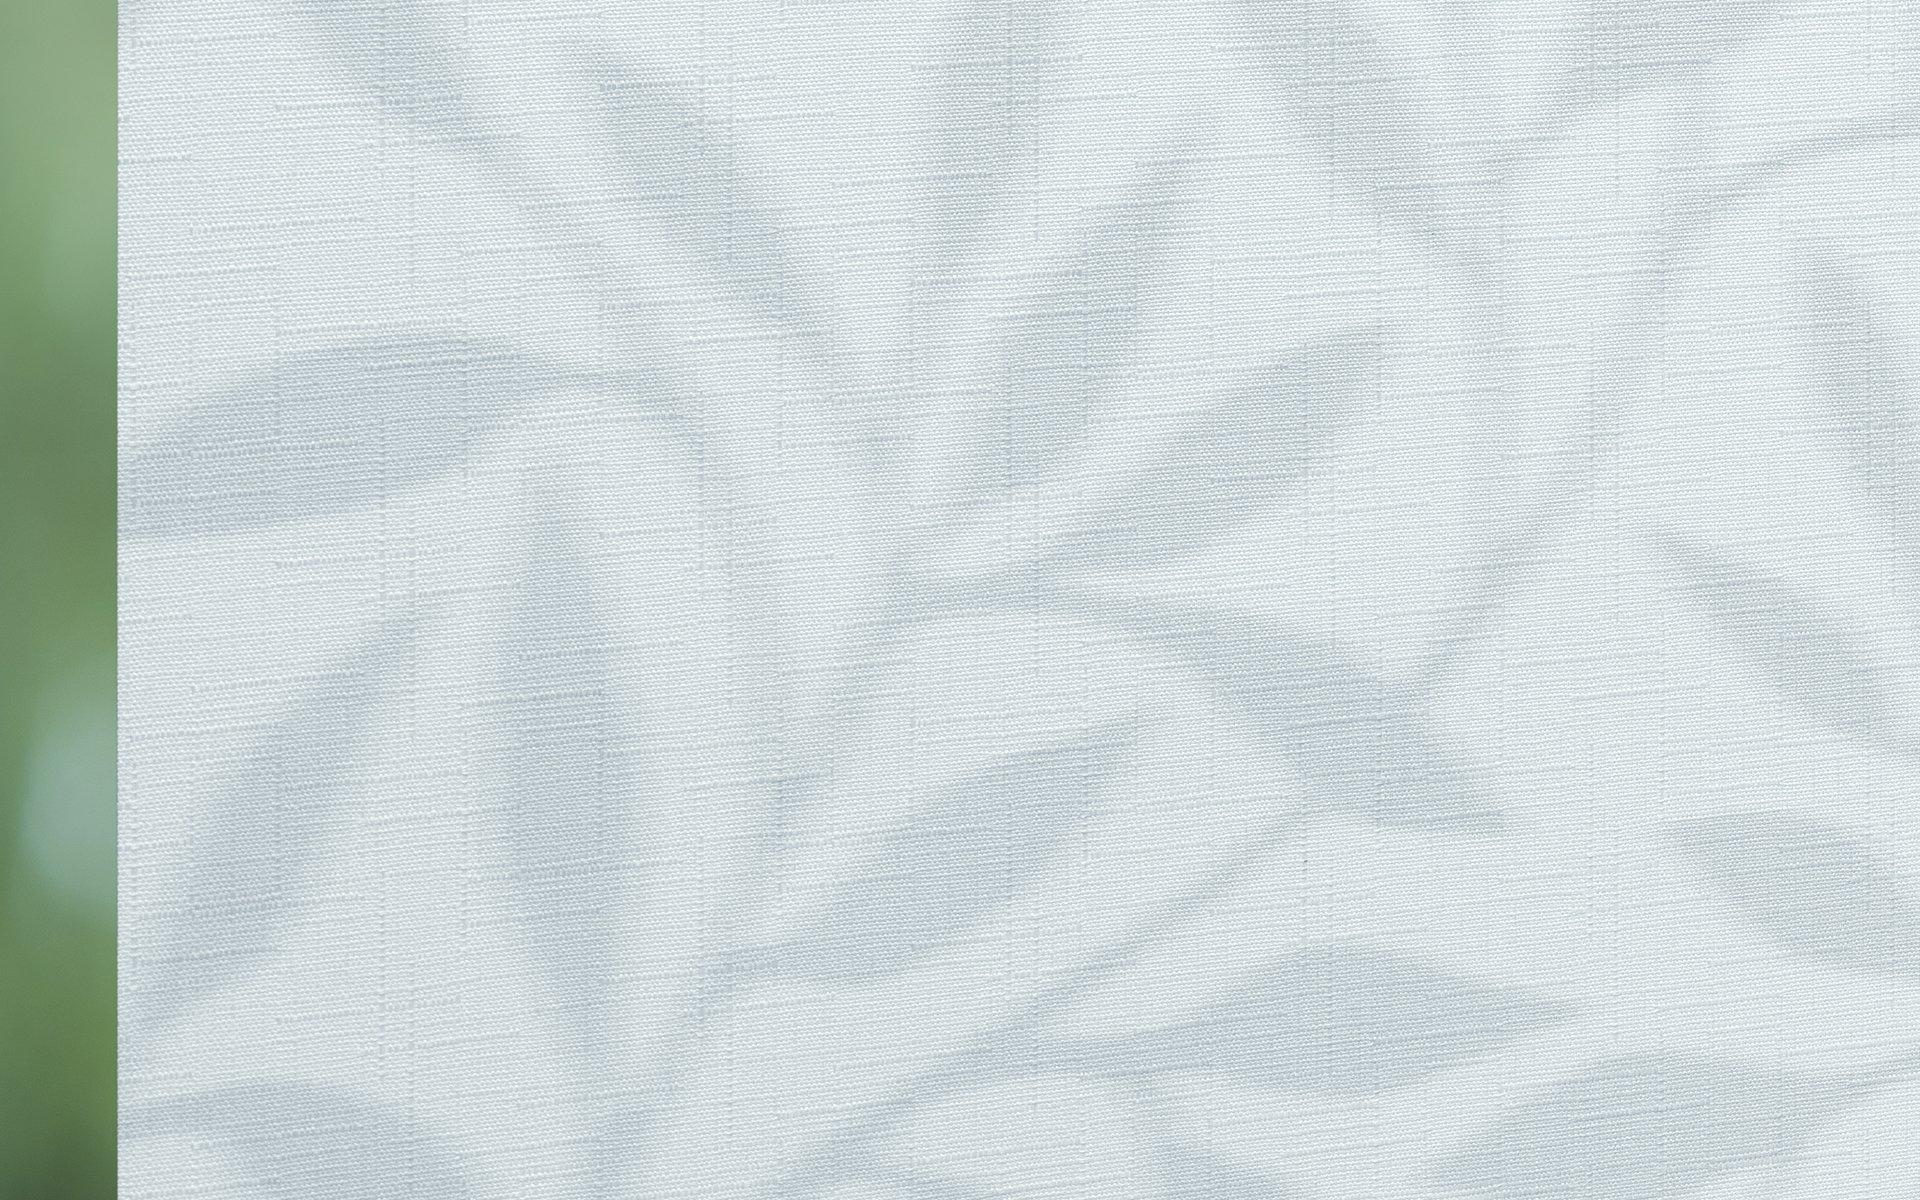 Rolgordijnen Slaapkamer 85 : Rolgordijnen